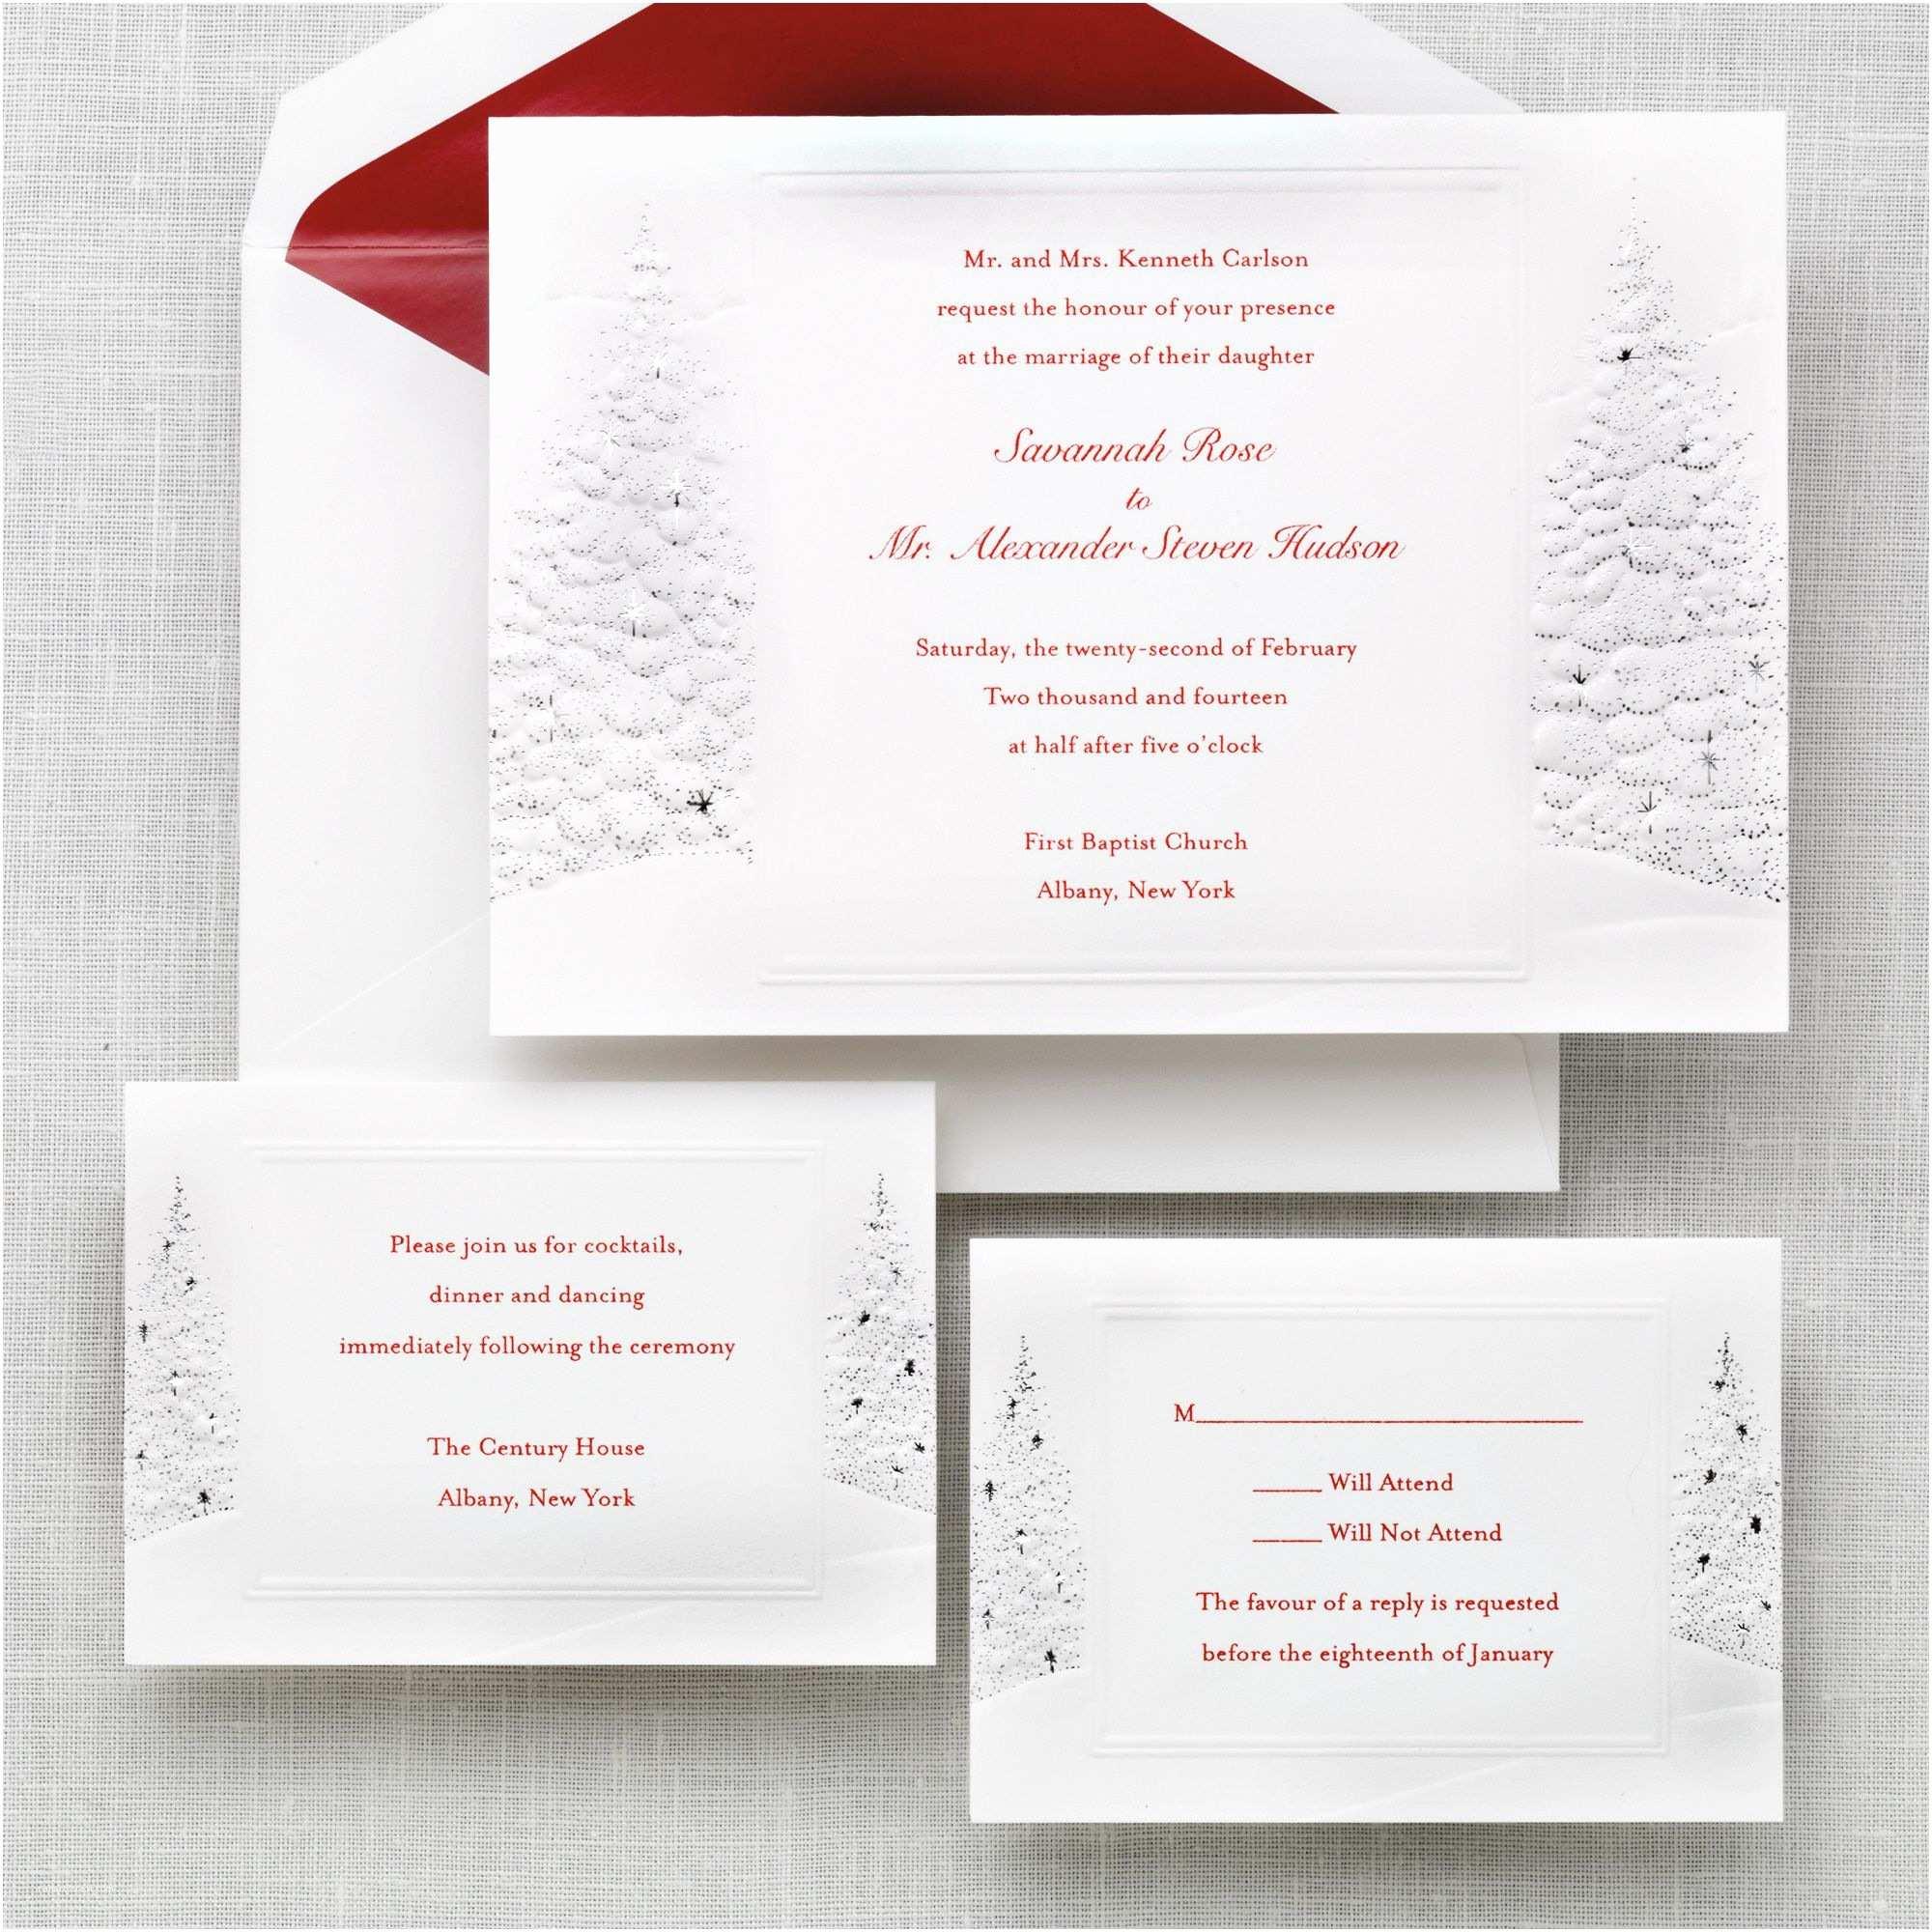 Wedding Invitation Size Make Your Own Standard Wedding Invitation Size Free